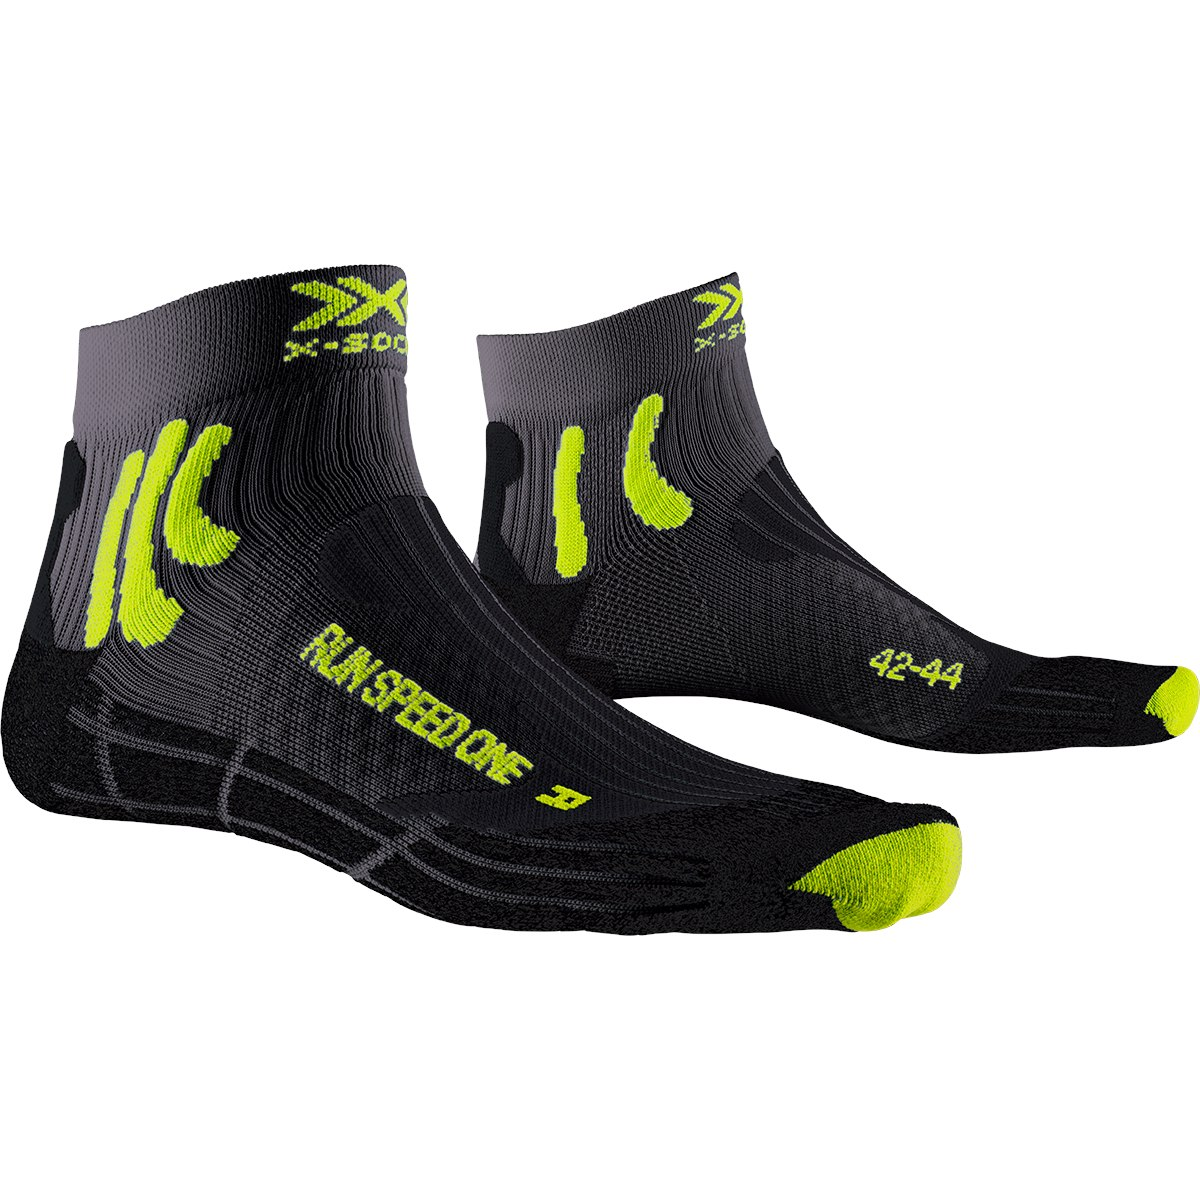 X-Socks Run Speed One Laufsocken - charcoal/phyton yellow/black